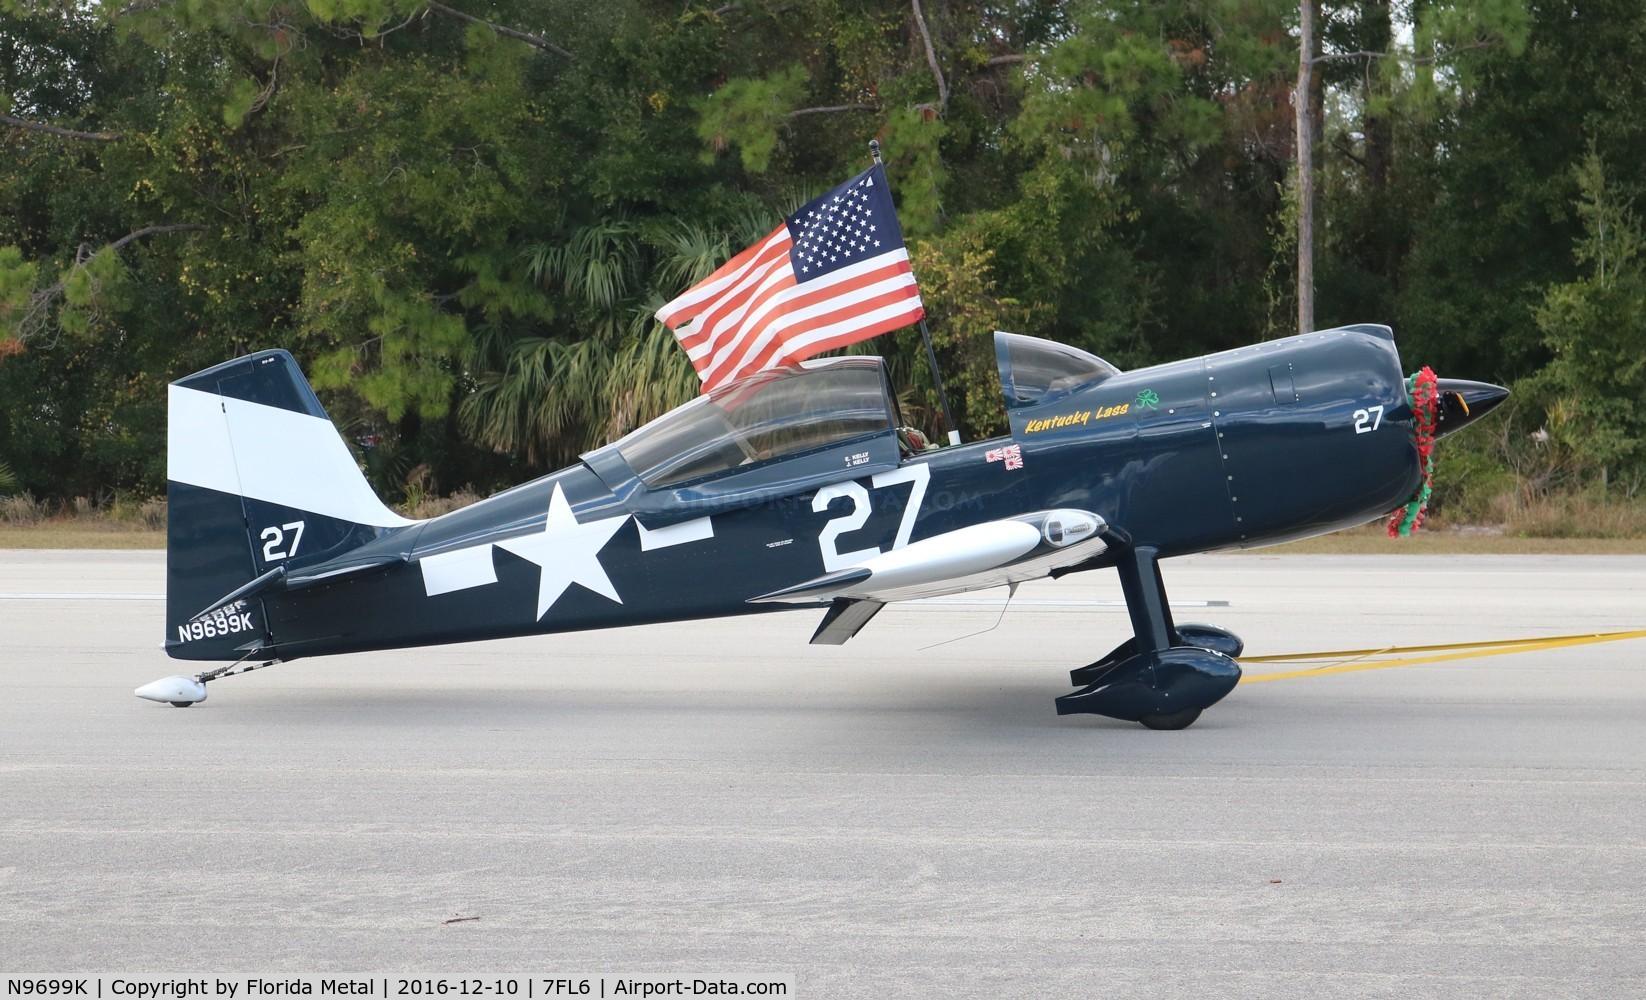 Aircraft N9699K (2015 Vans RV-8 C/N 82562) Photo by Florida